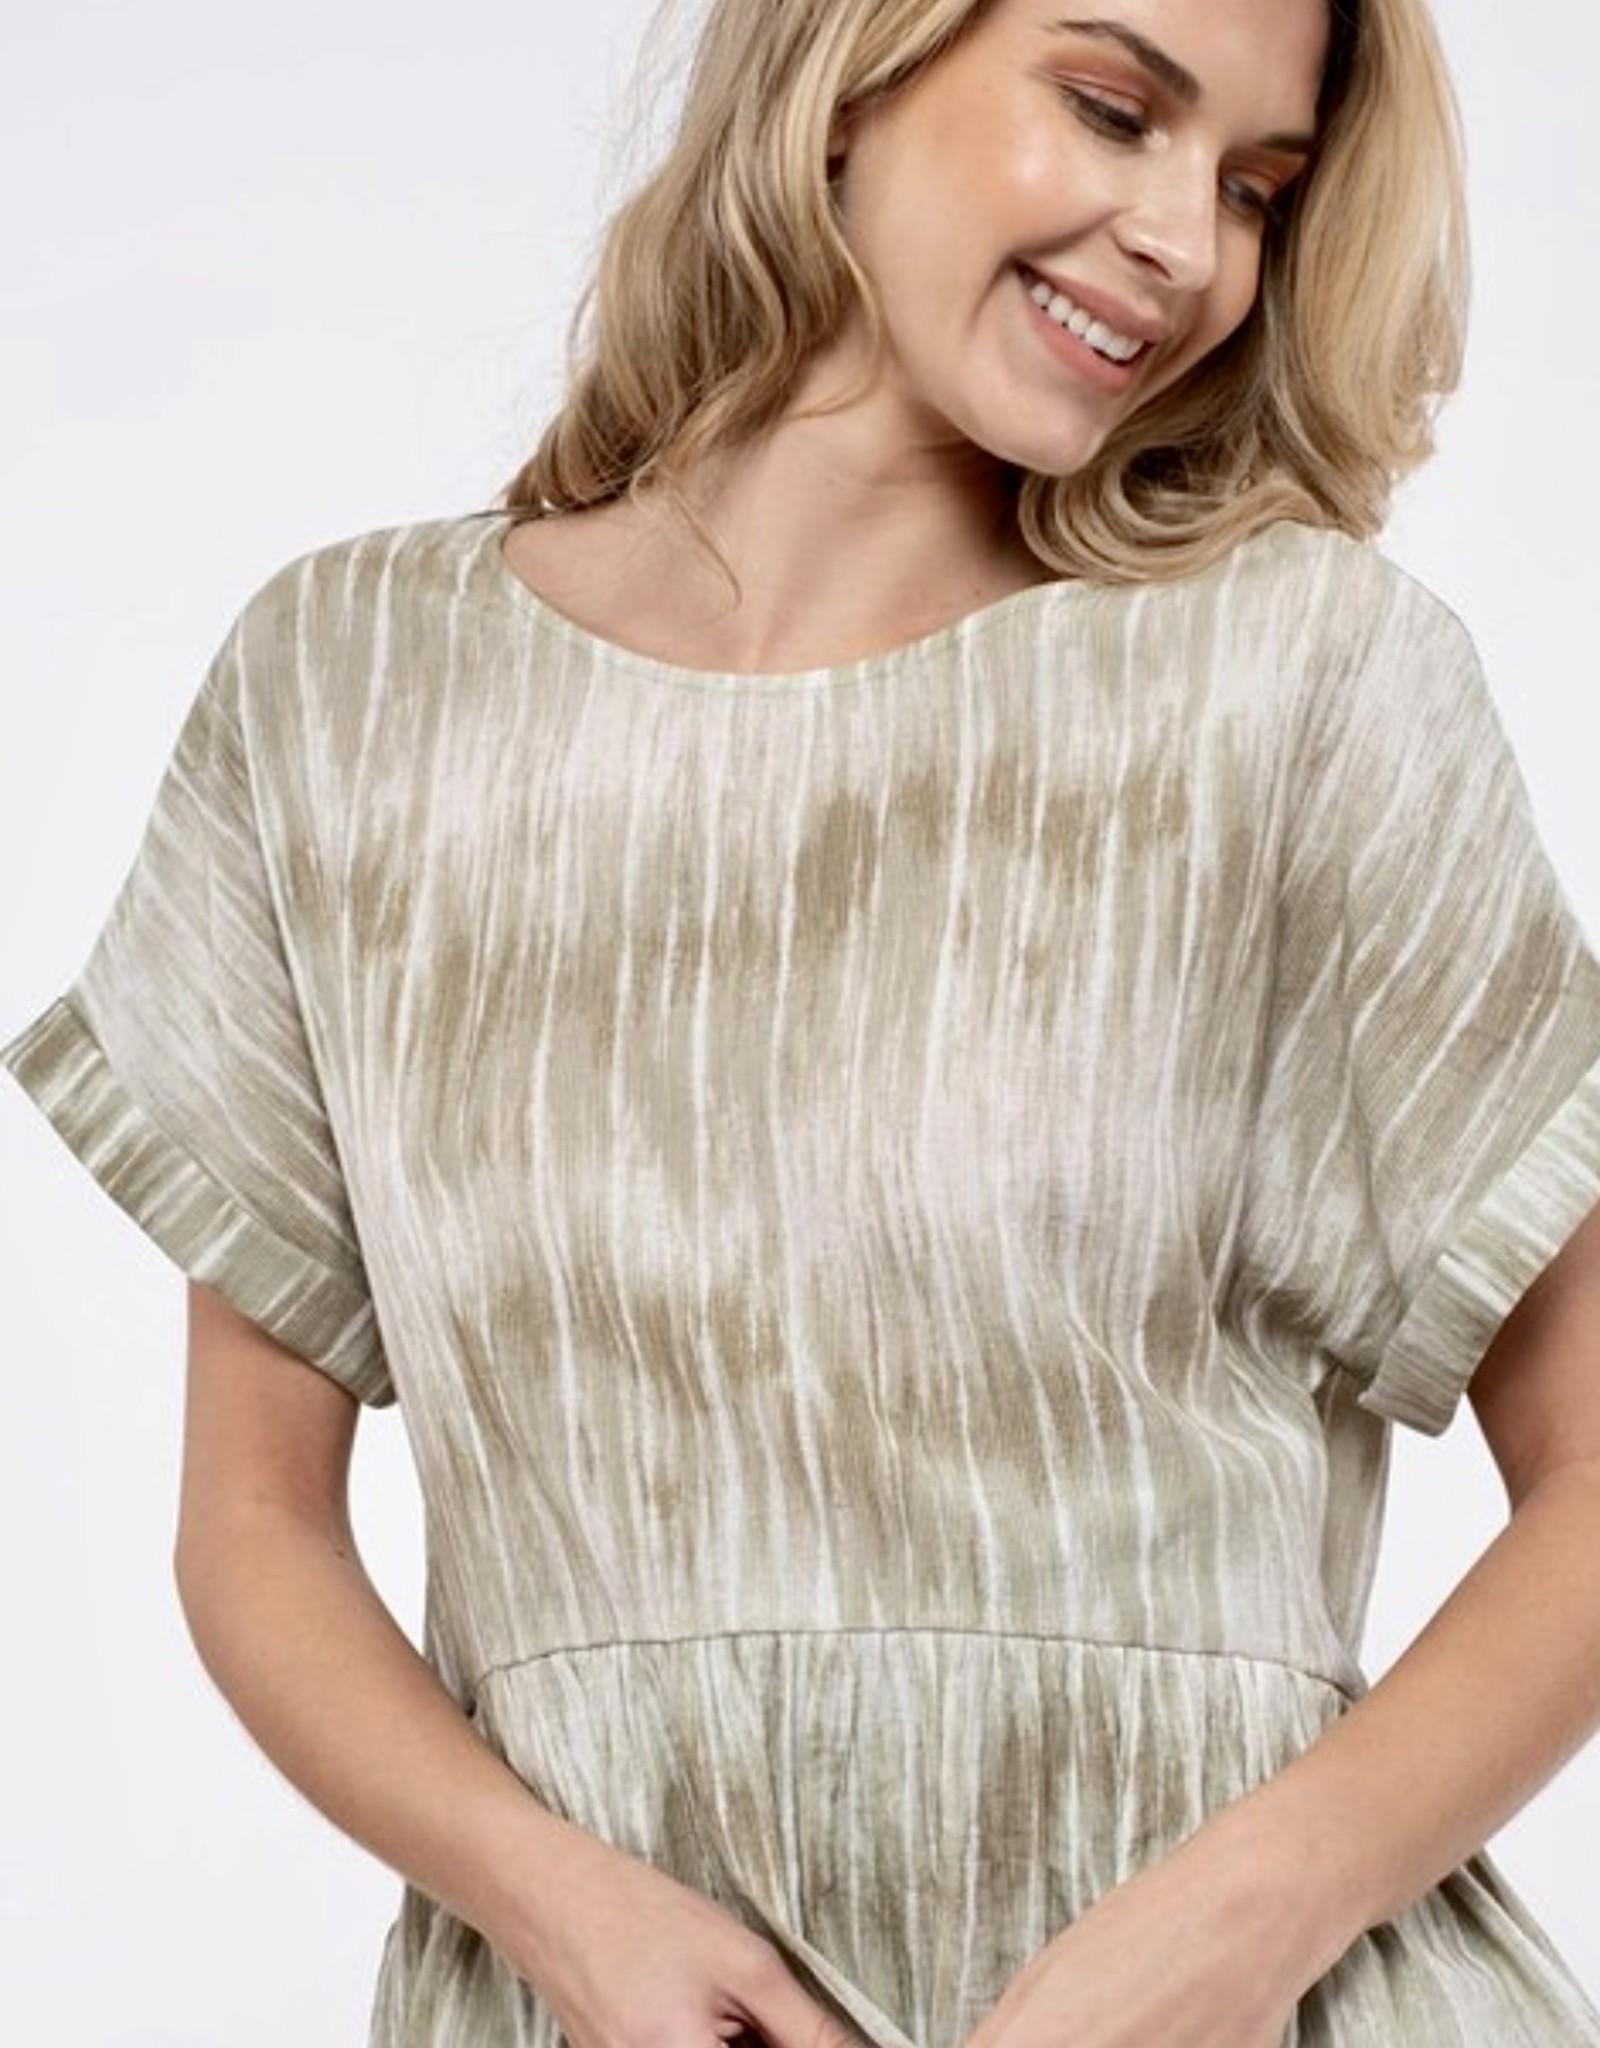 HUSH Printed peplum short sleeve blouse